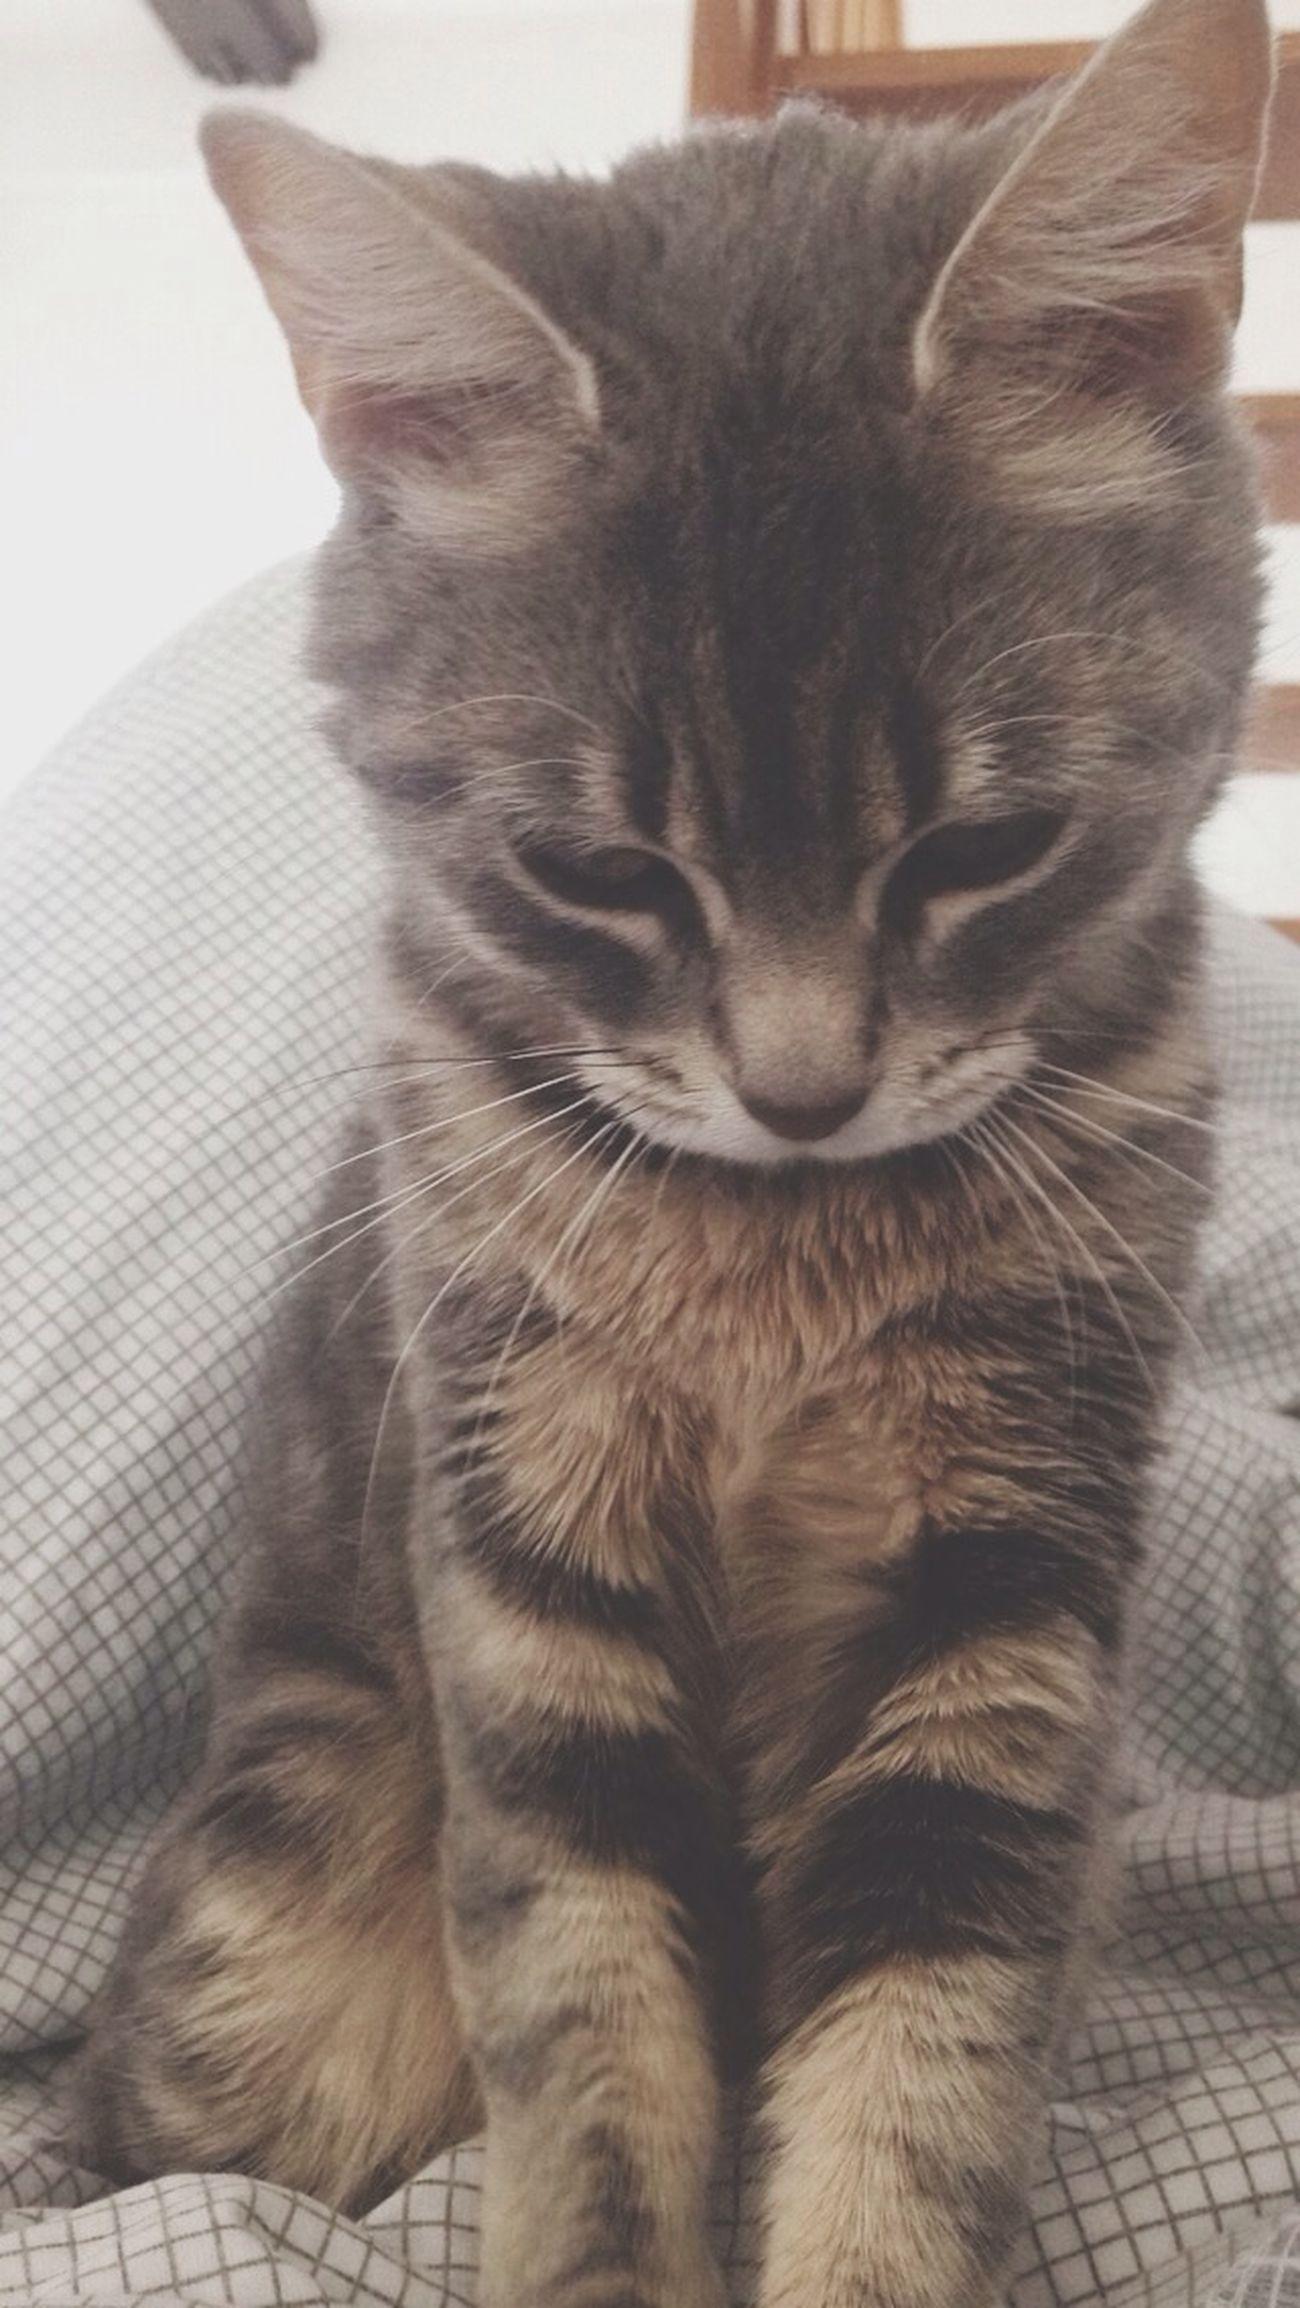 Houna Cat Baby Cat ❤️❤️